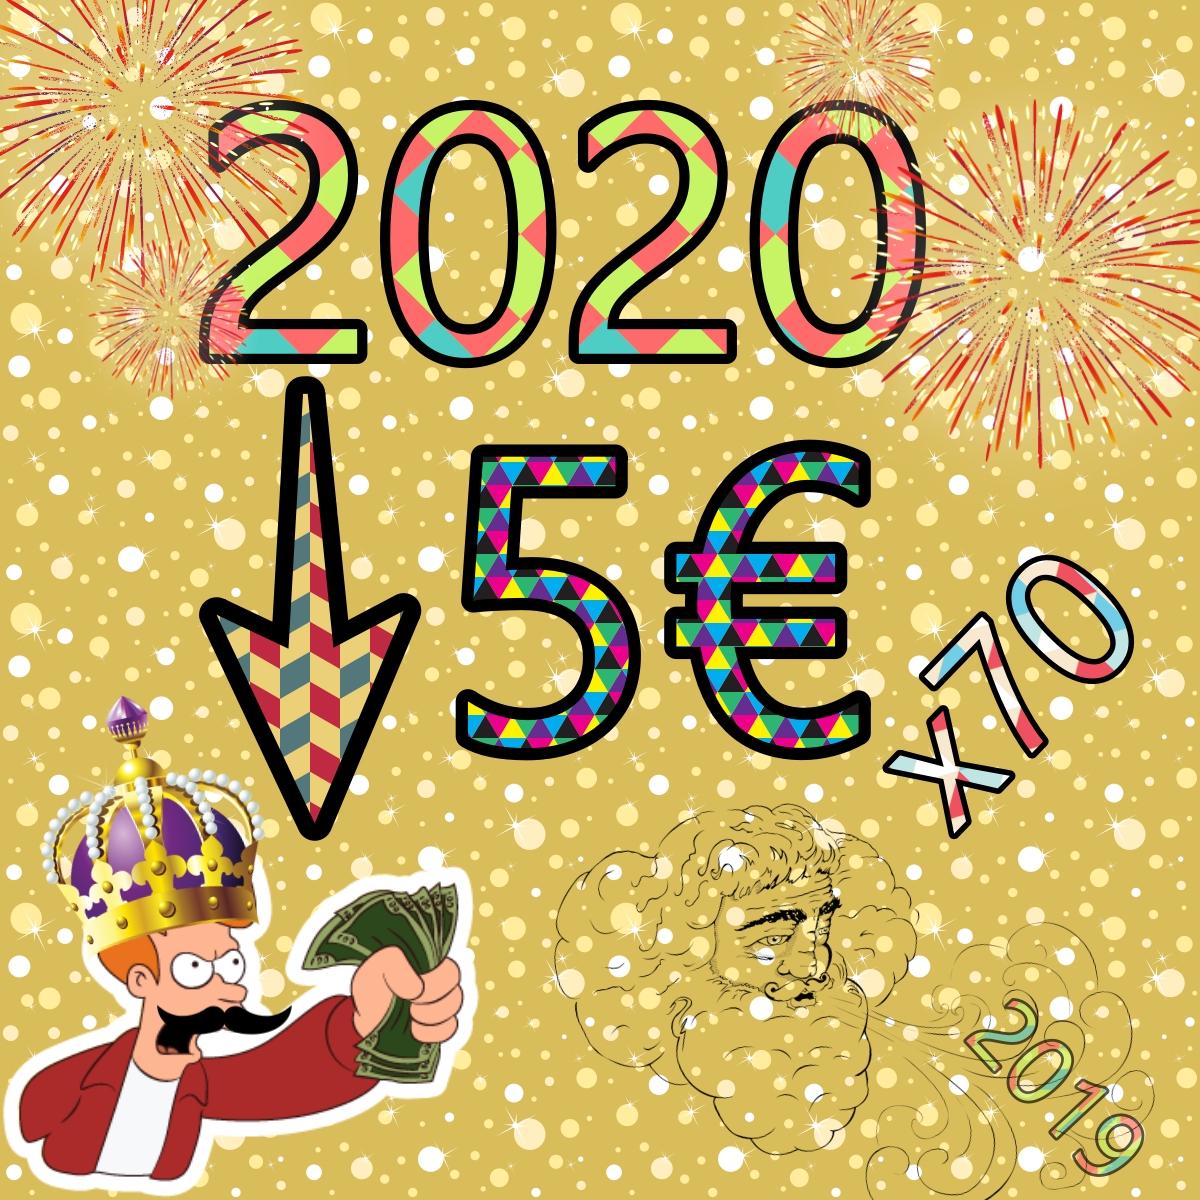 [-5€ ReacoCopilación ] 70 Productos MB/CN de AmazonWh para despedir 2019 por menos de 5€ ***ACTUALIZADO